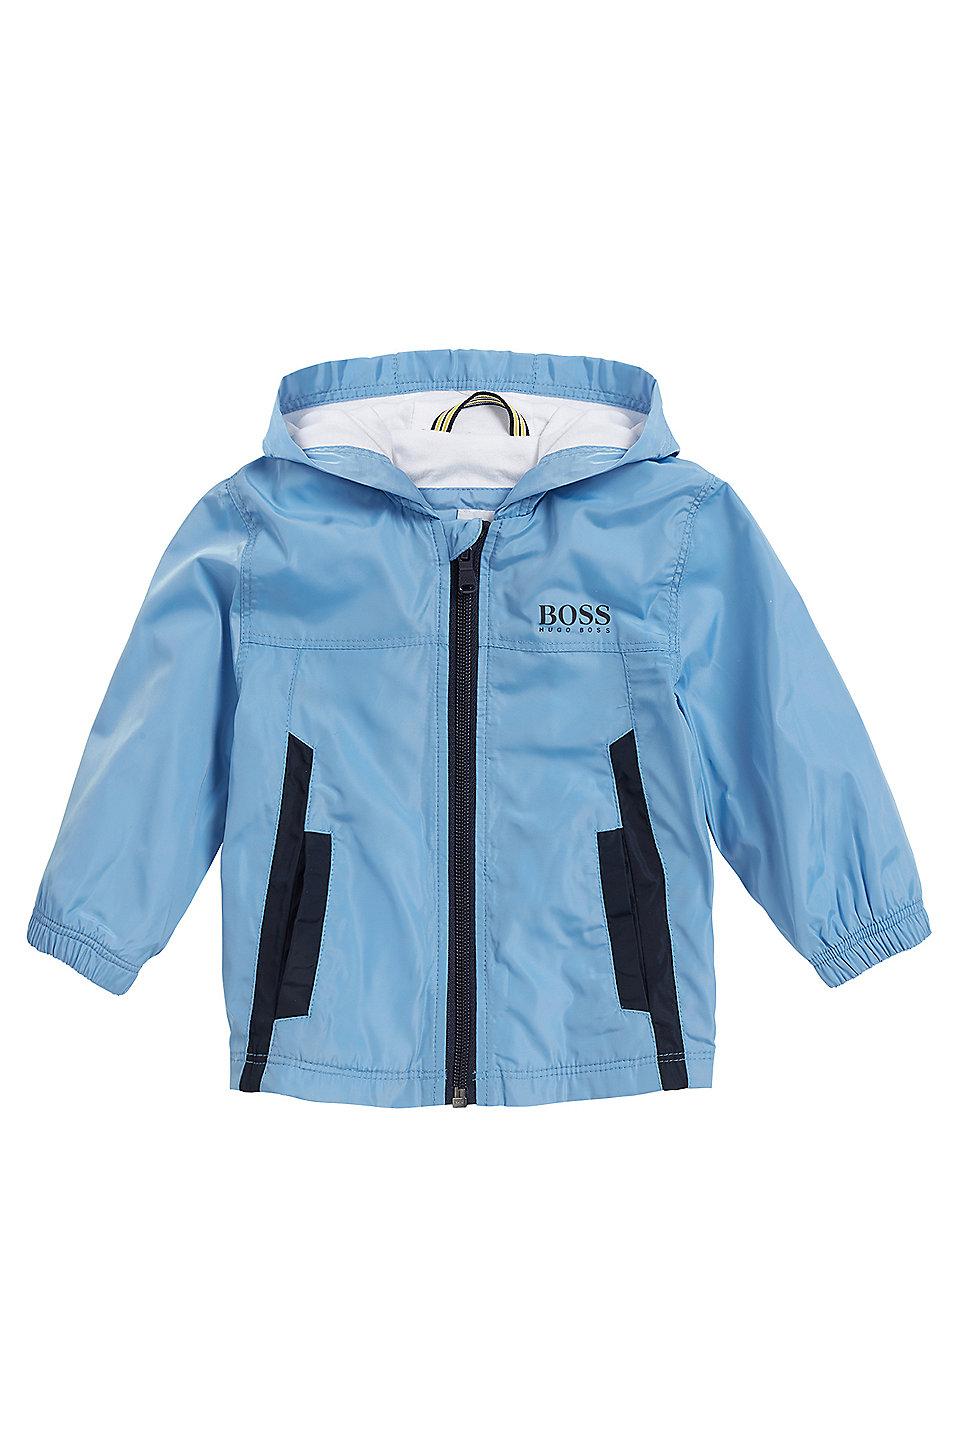 2cfaec3dd3c9 BOSS - Kids  windbreaker jacket with cotton jersey lining